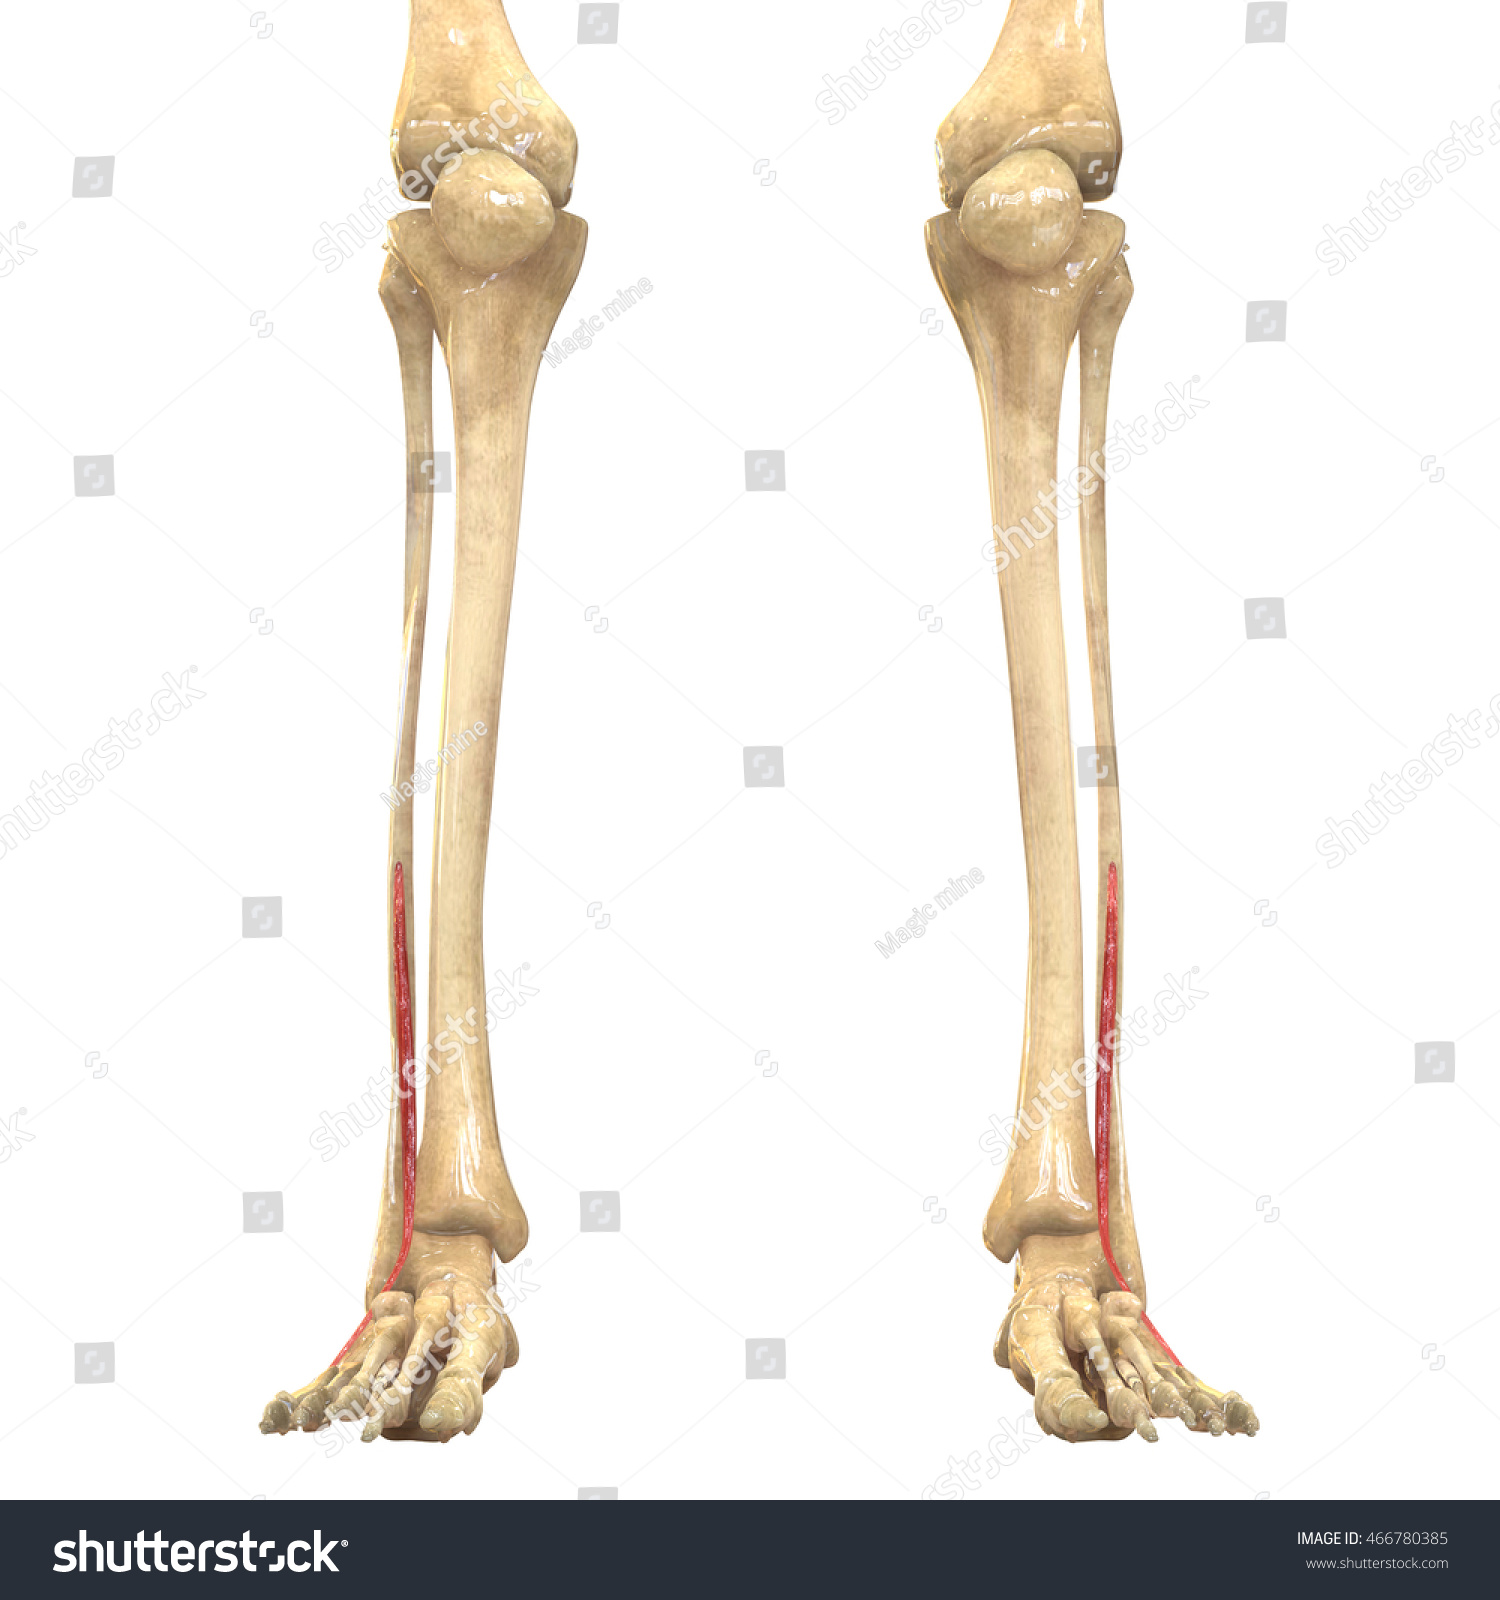 Human Body Muscles Anatomy Peroneus Tertius Stock Illustration